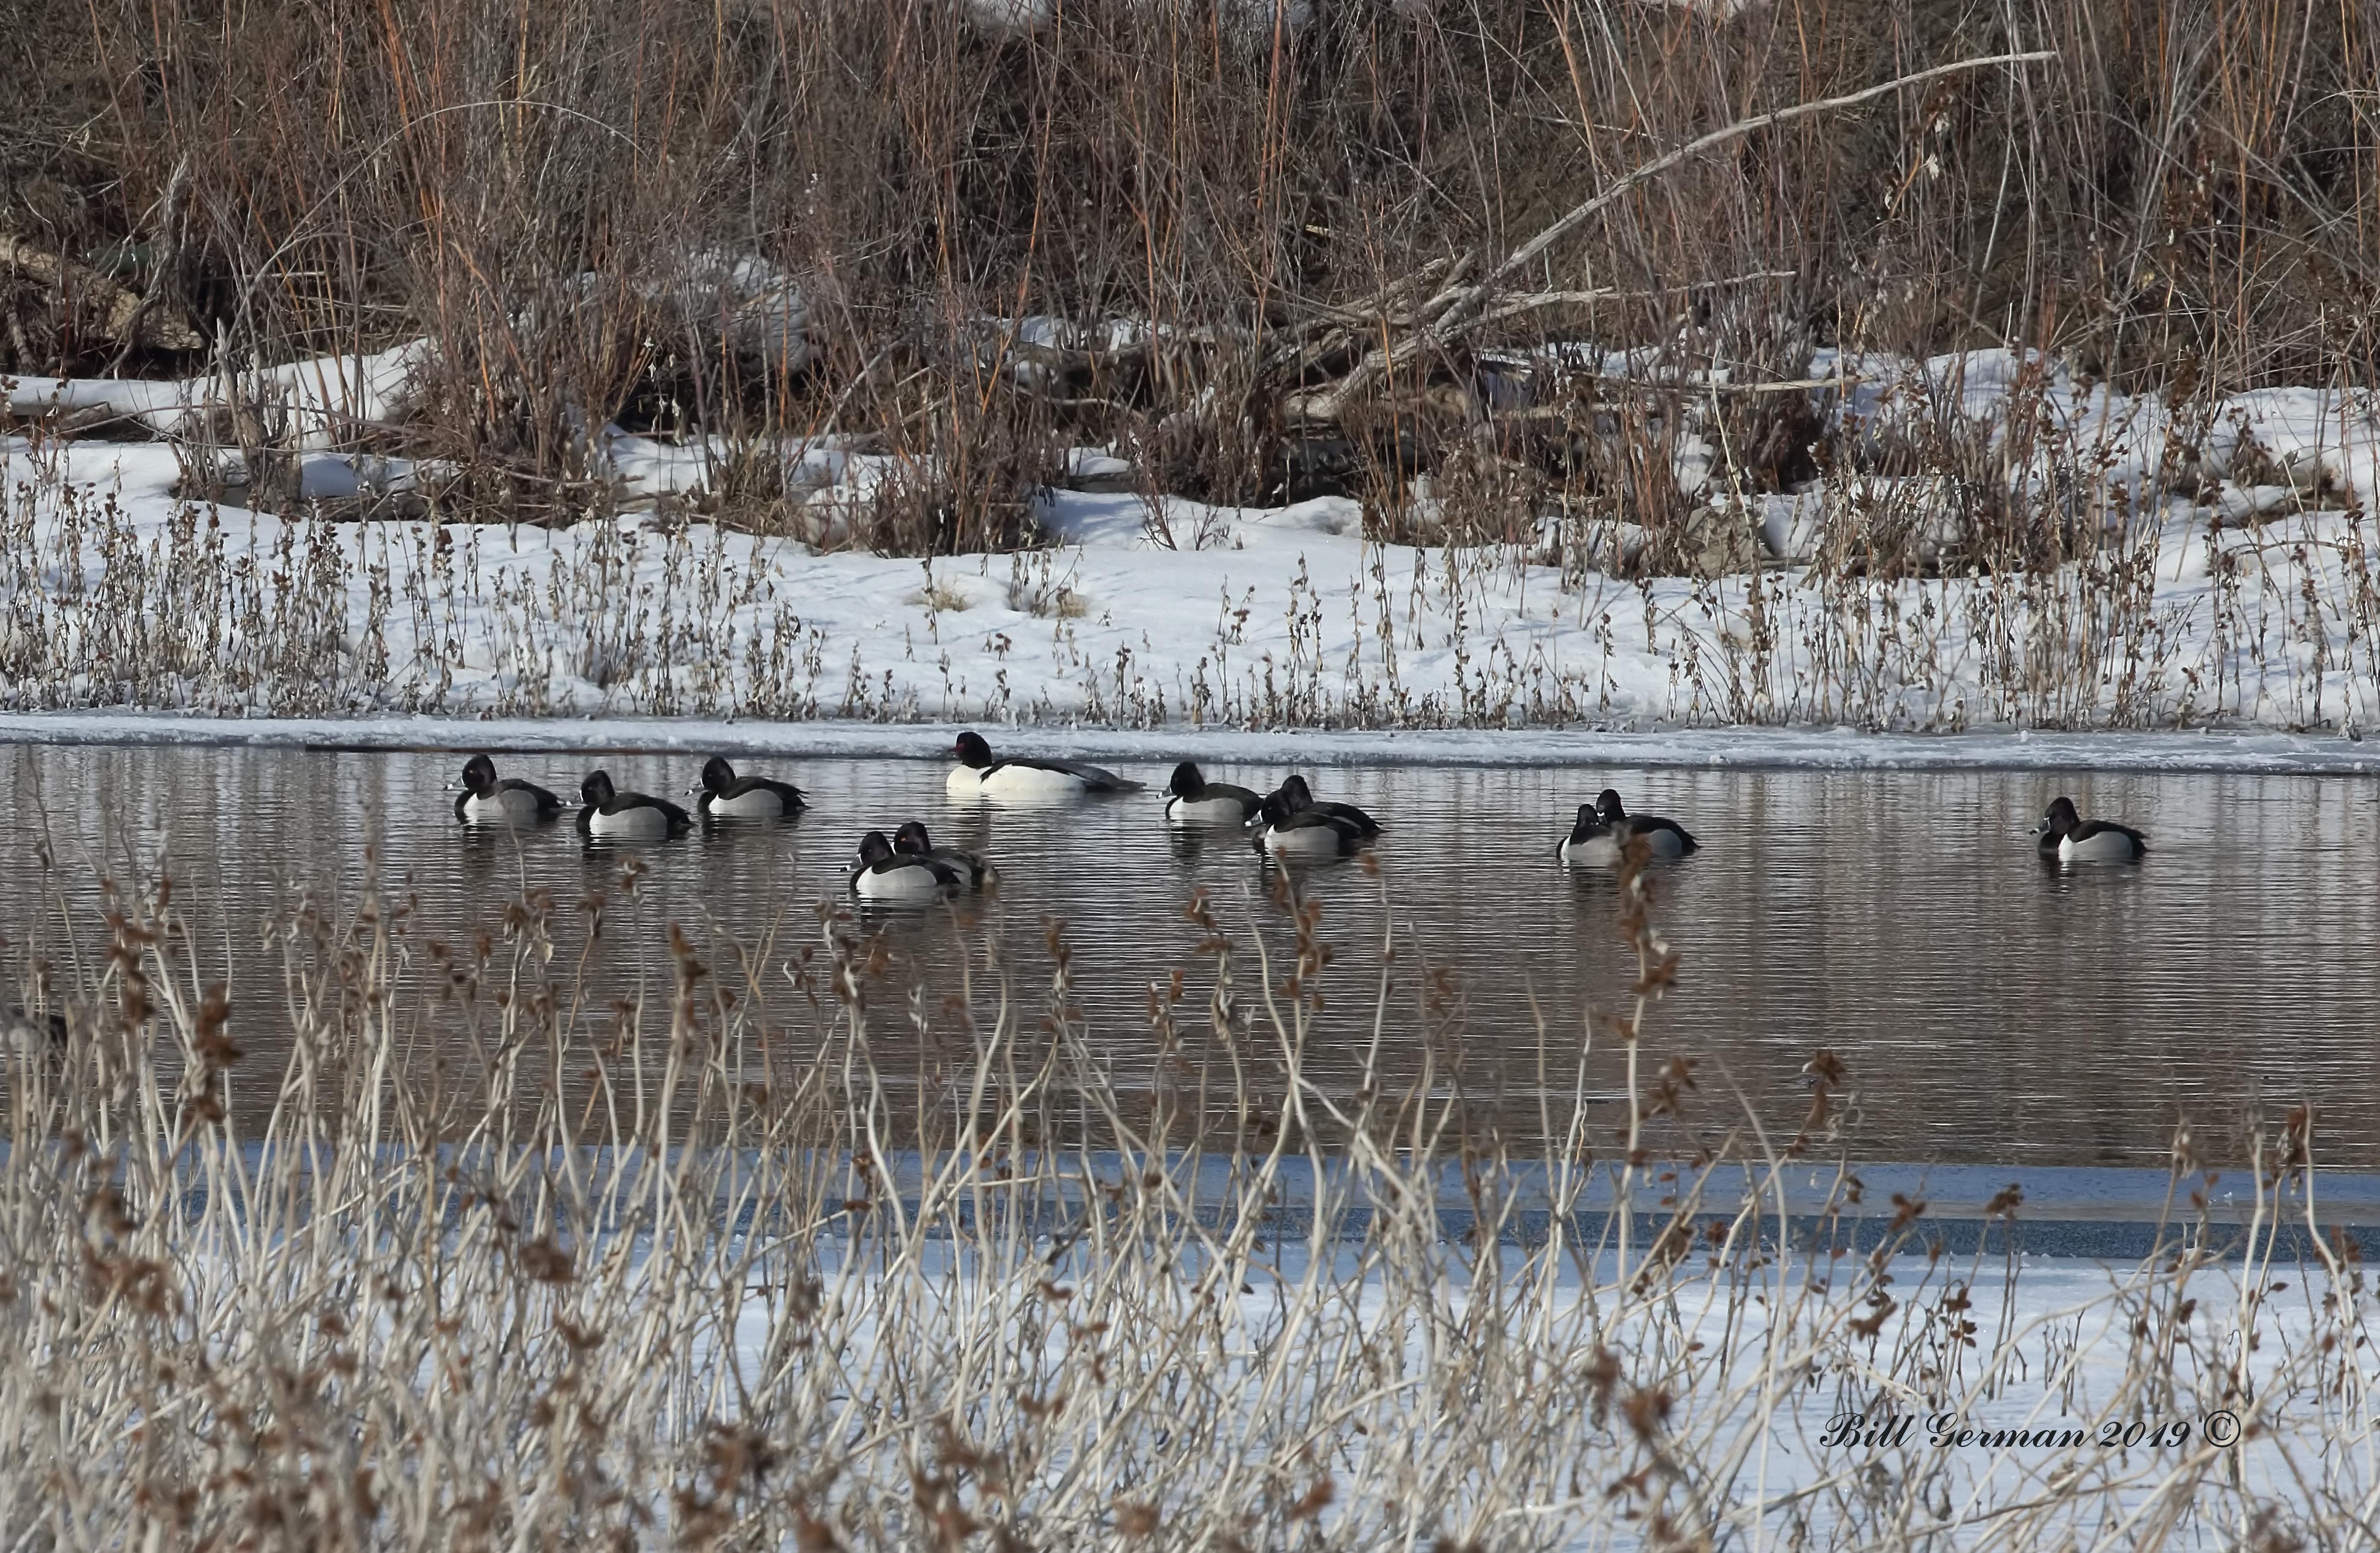 Ring Neck Ducks 0M2A9772a.jpg